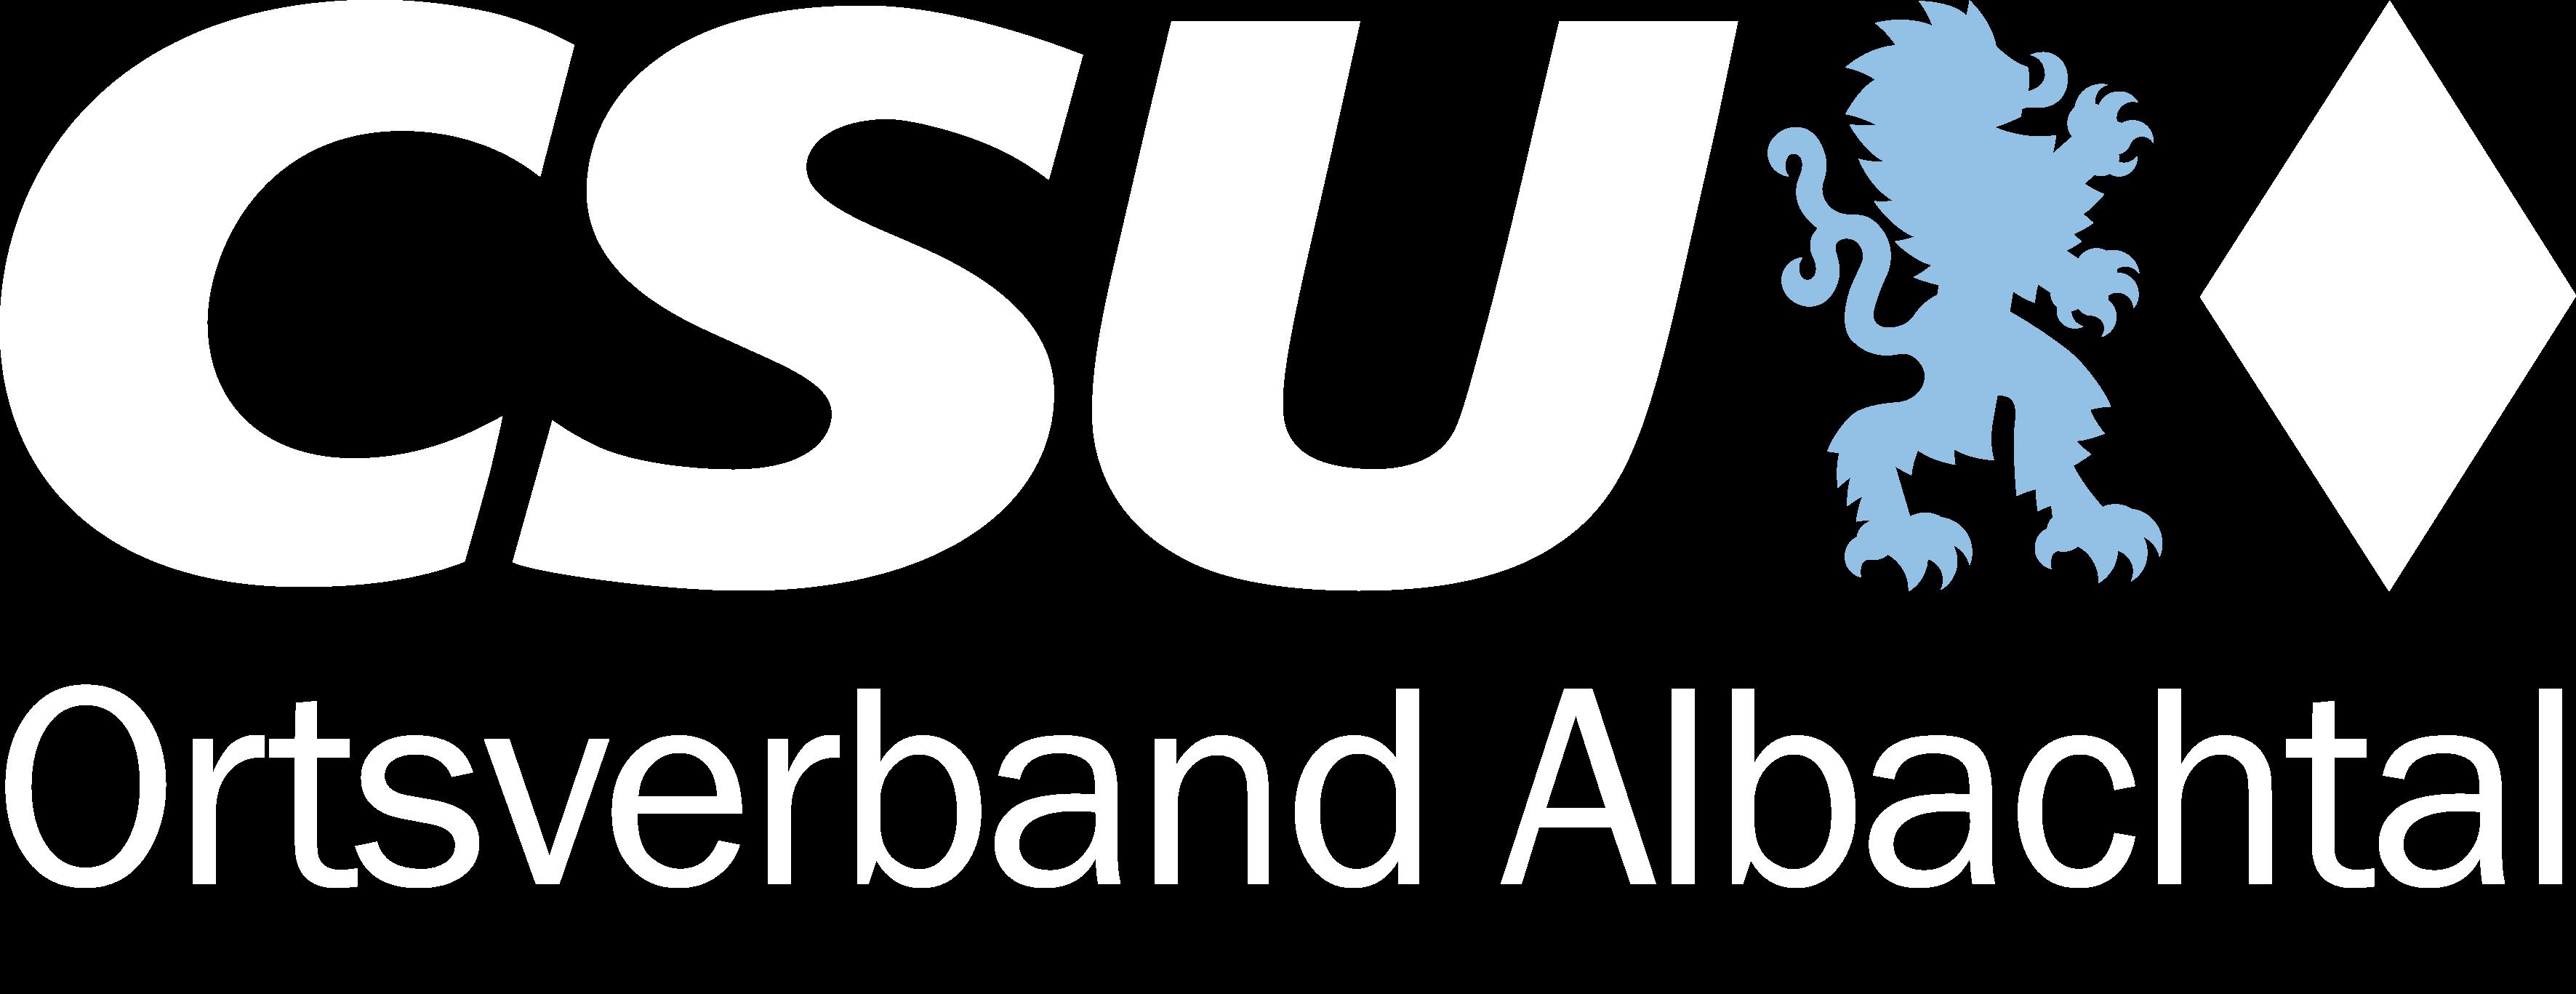 CSU Albachtal